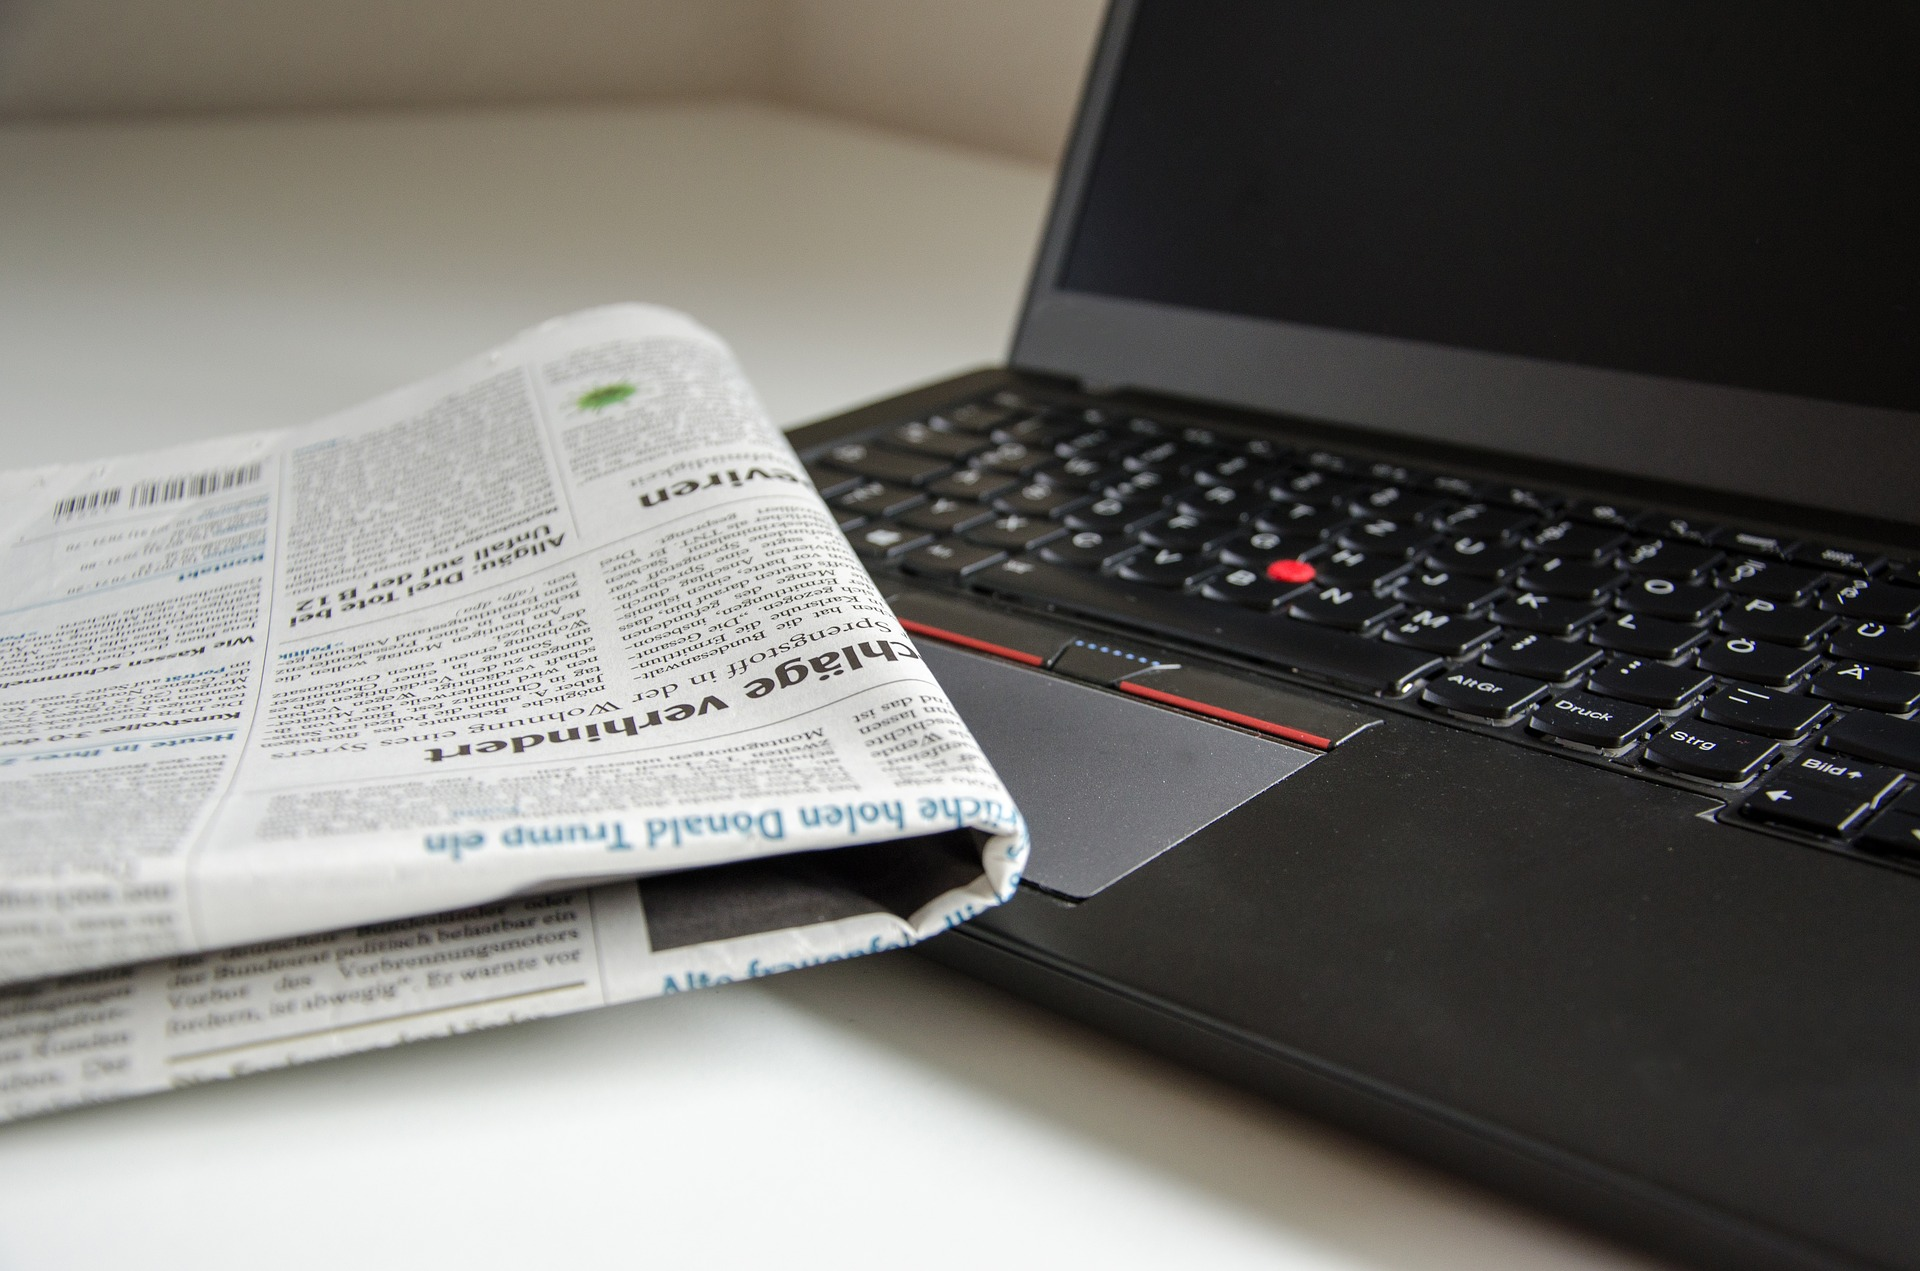 Newspaper on top of laptop keyboard